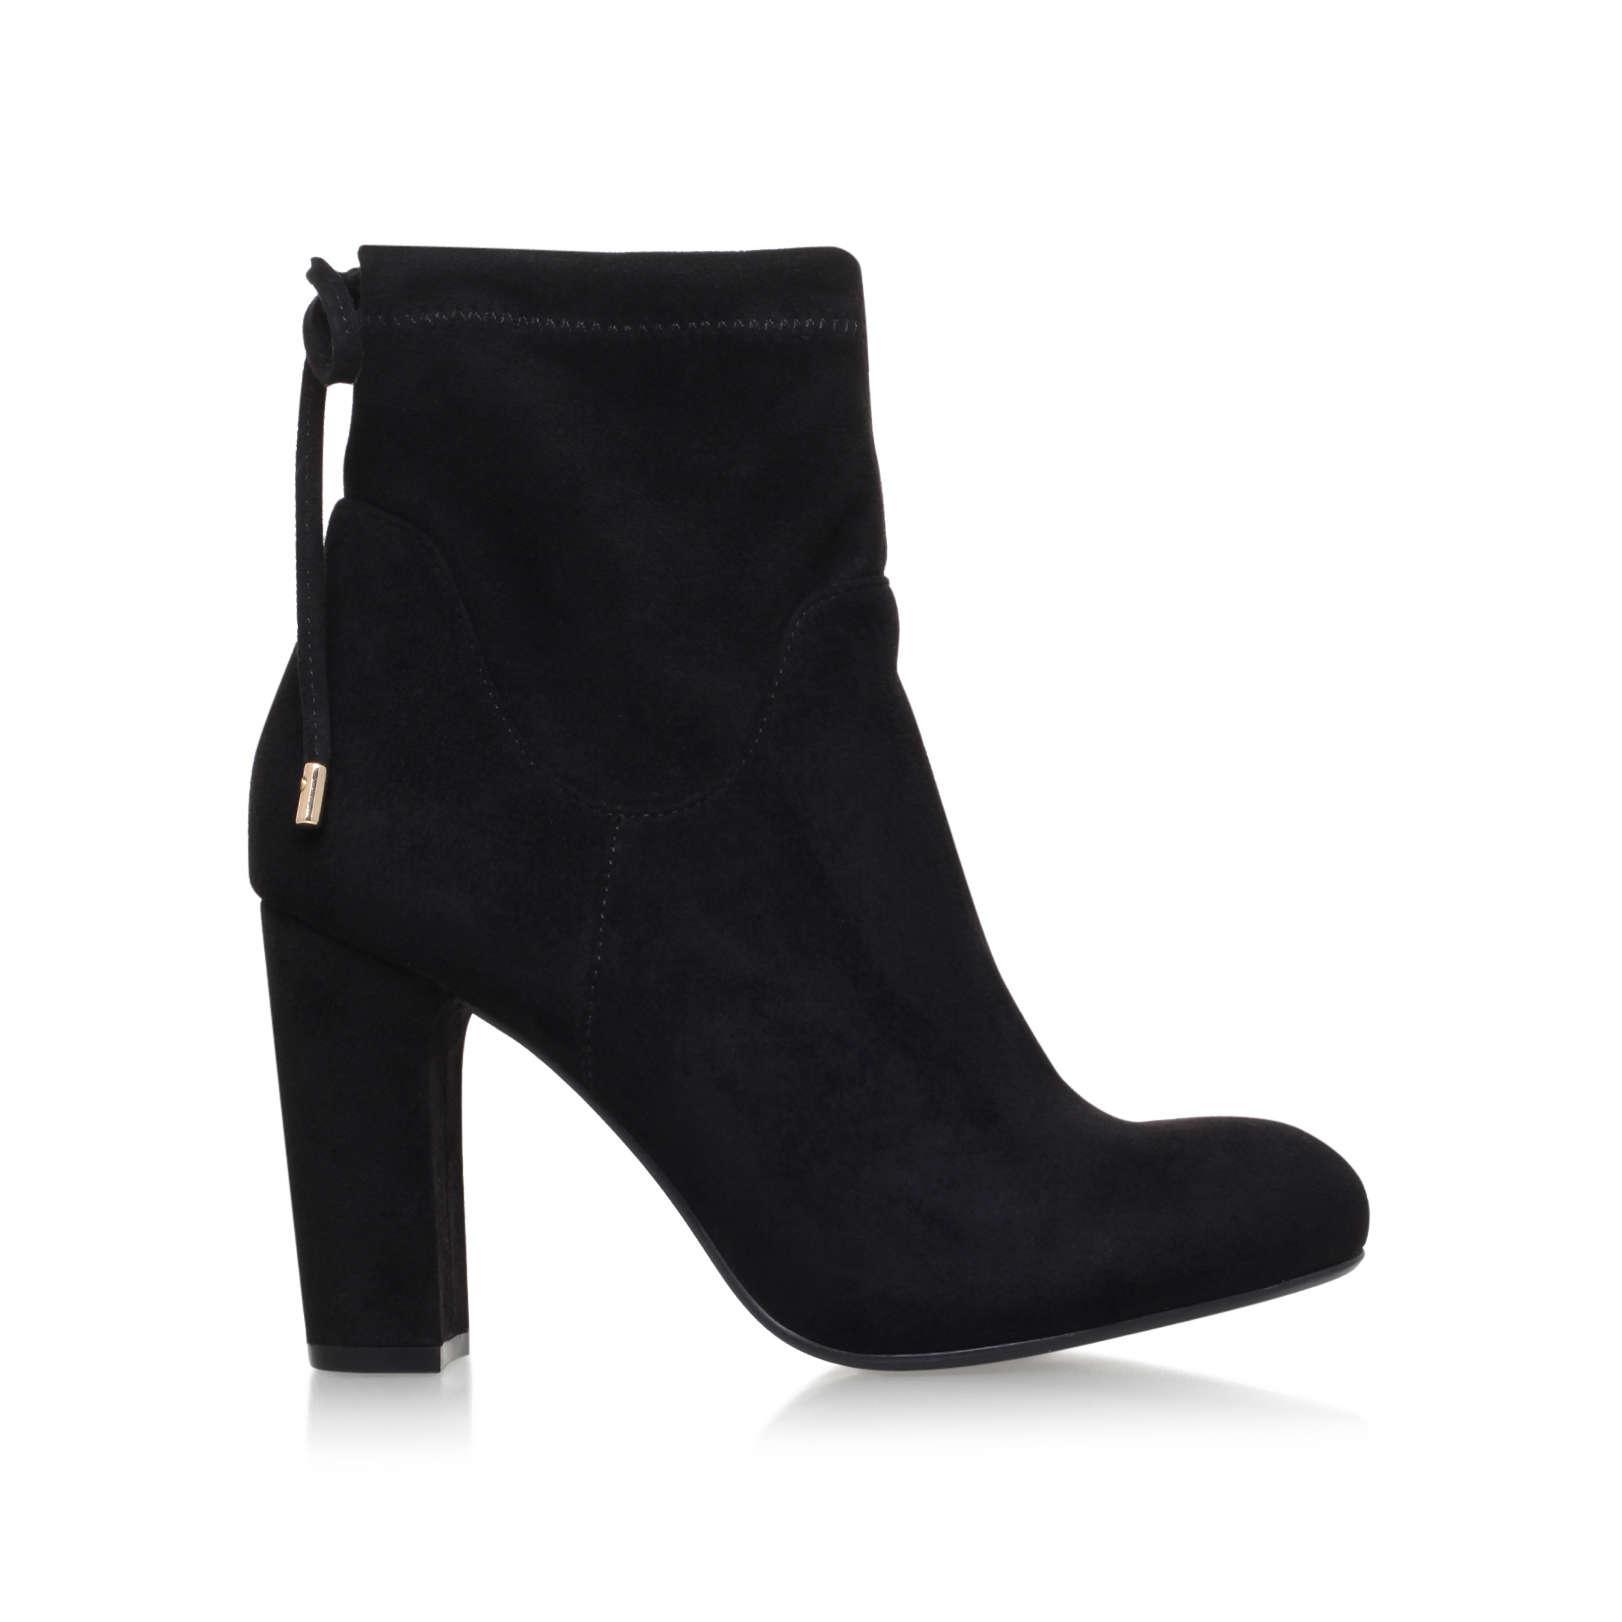 Carvela Kurt Geiger Denim Pacey Ankle Boots in Black